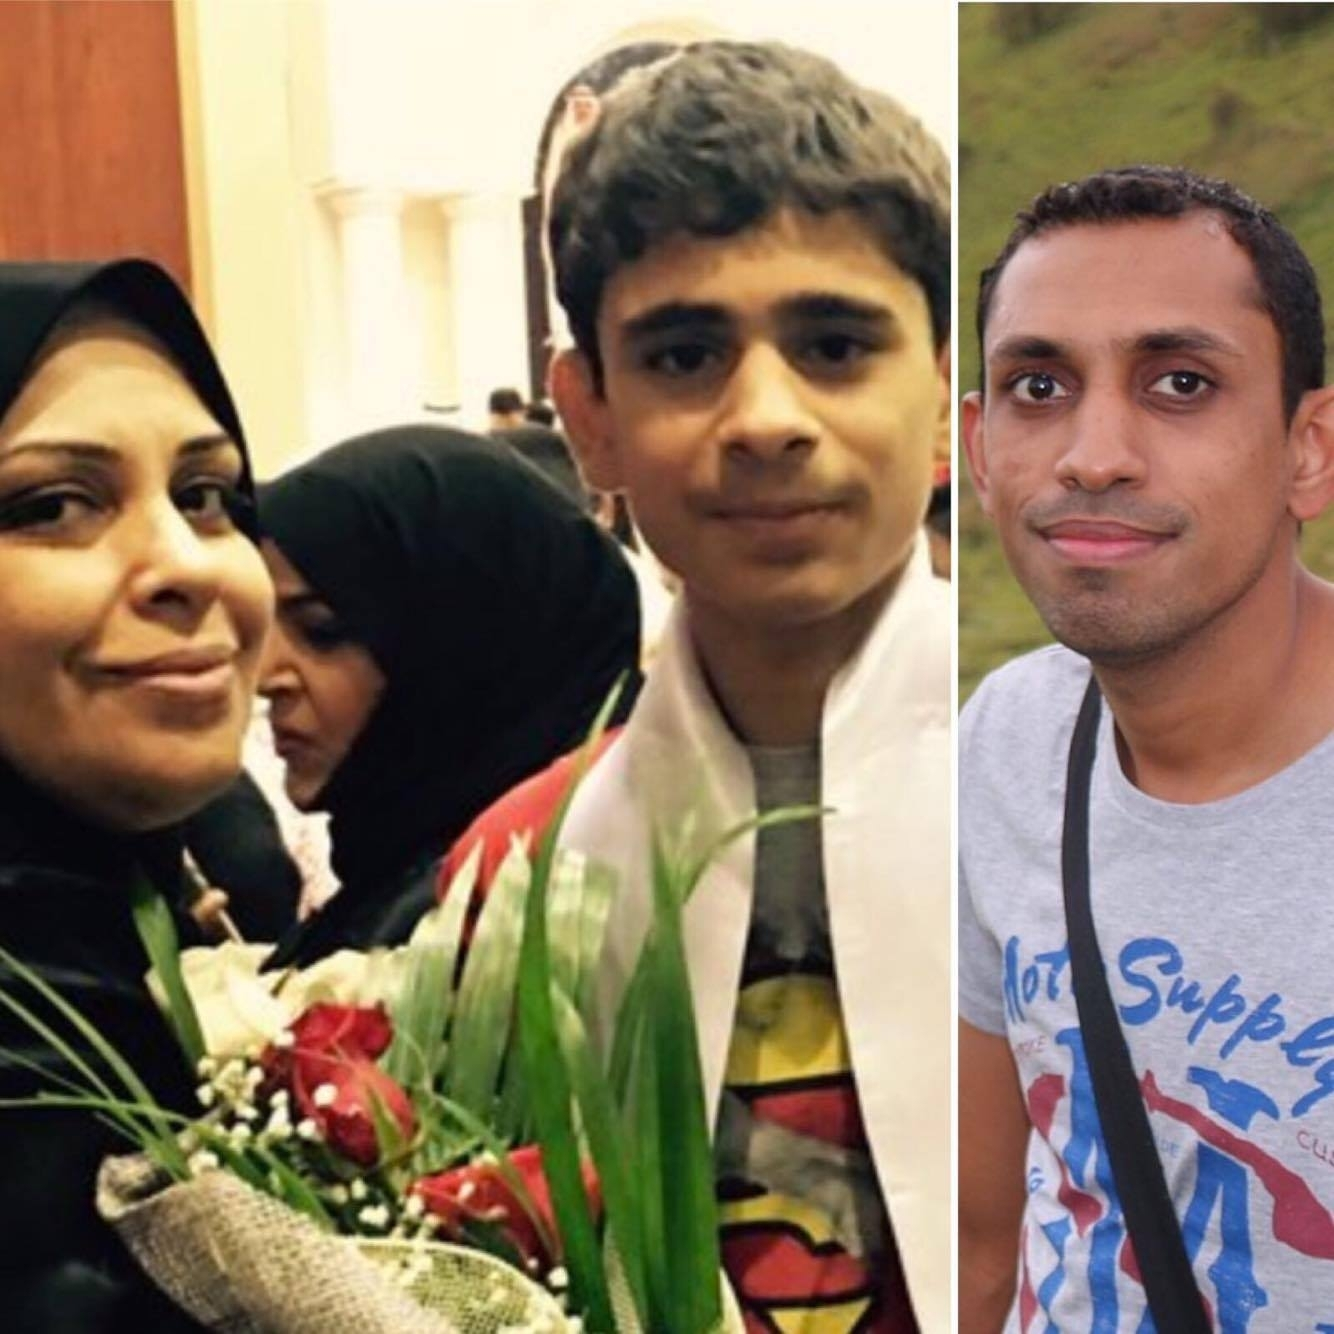 Sayed Alwadaei family